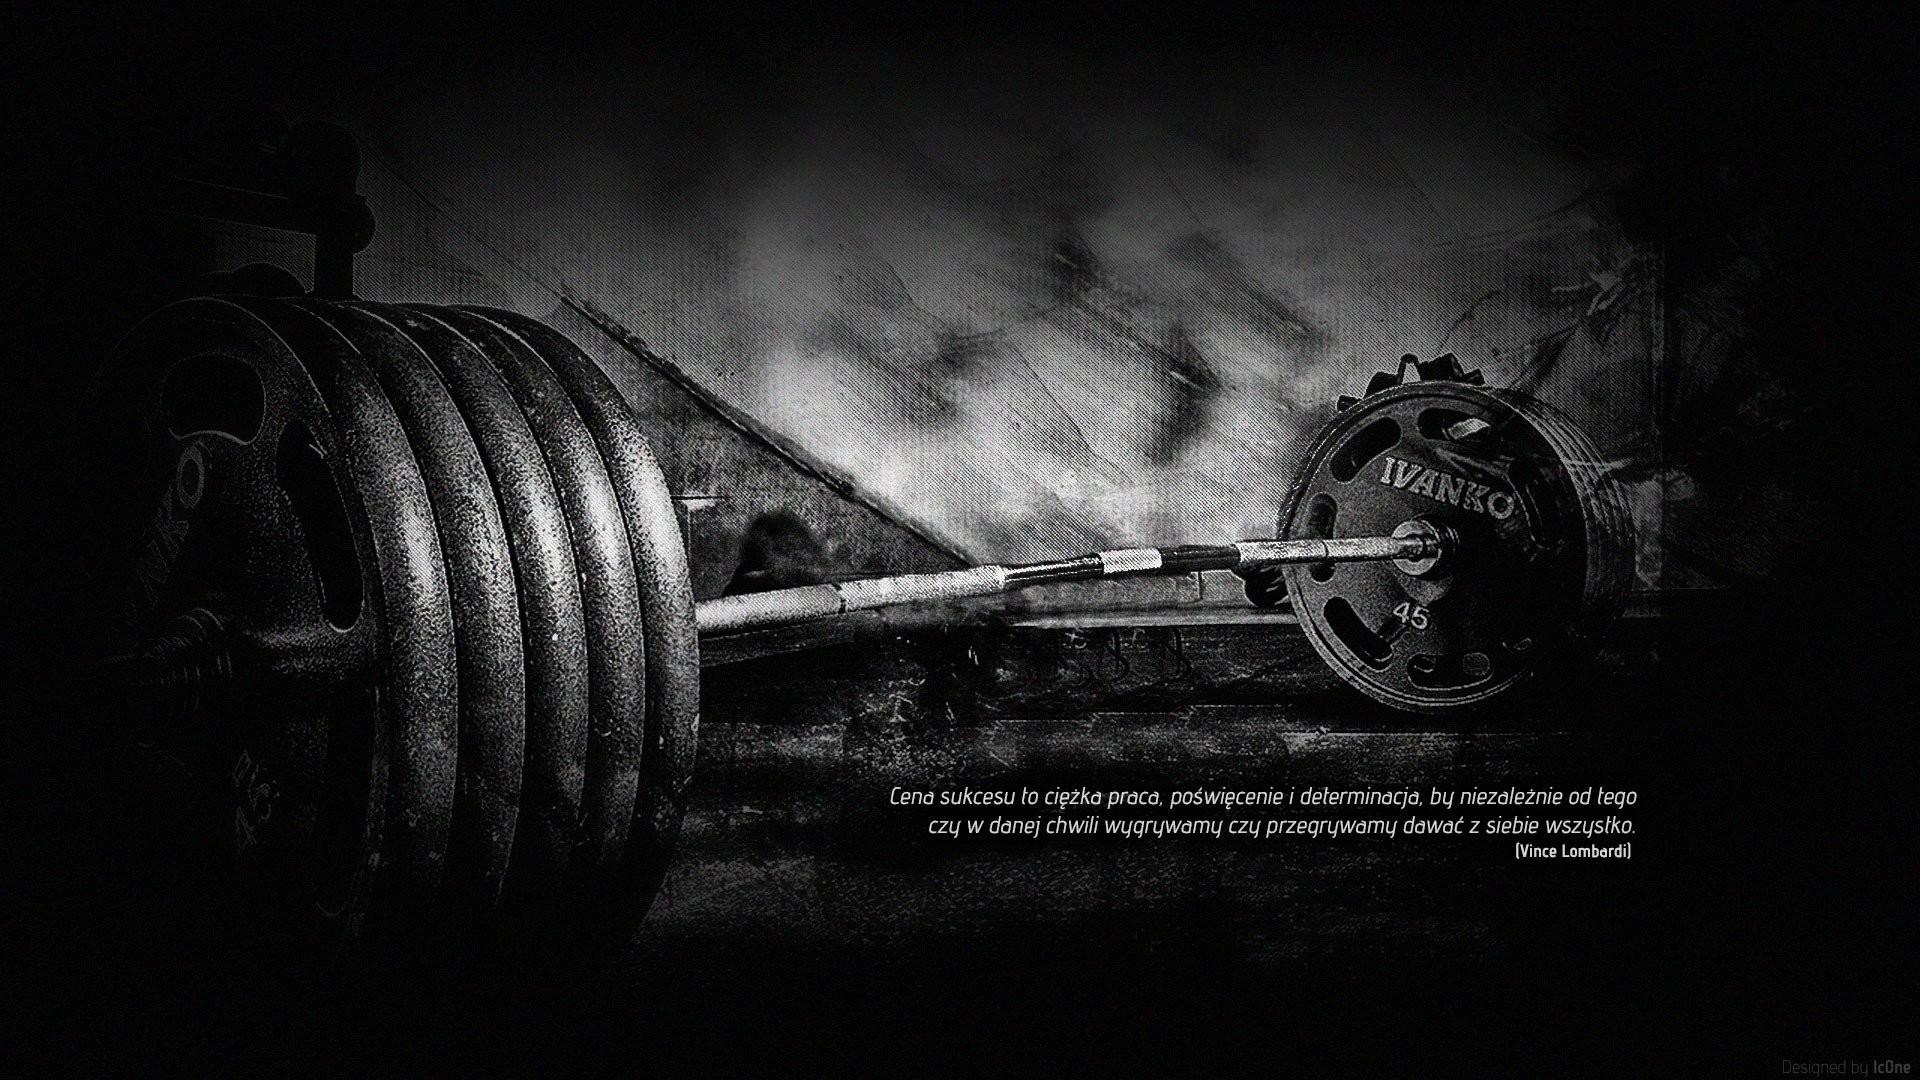 gym fitness motivation tapeta lc0ne siAOaeuownia wallpaper background .